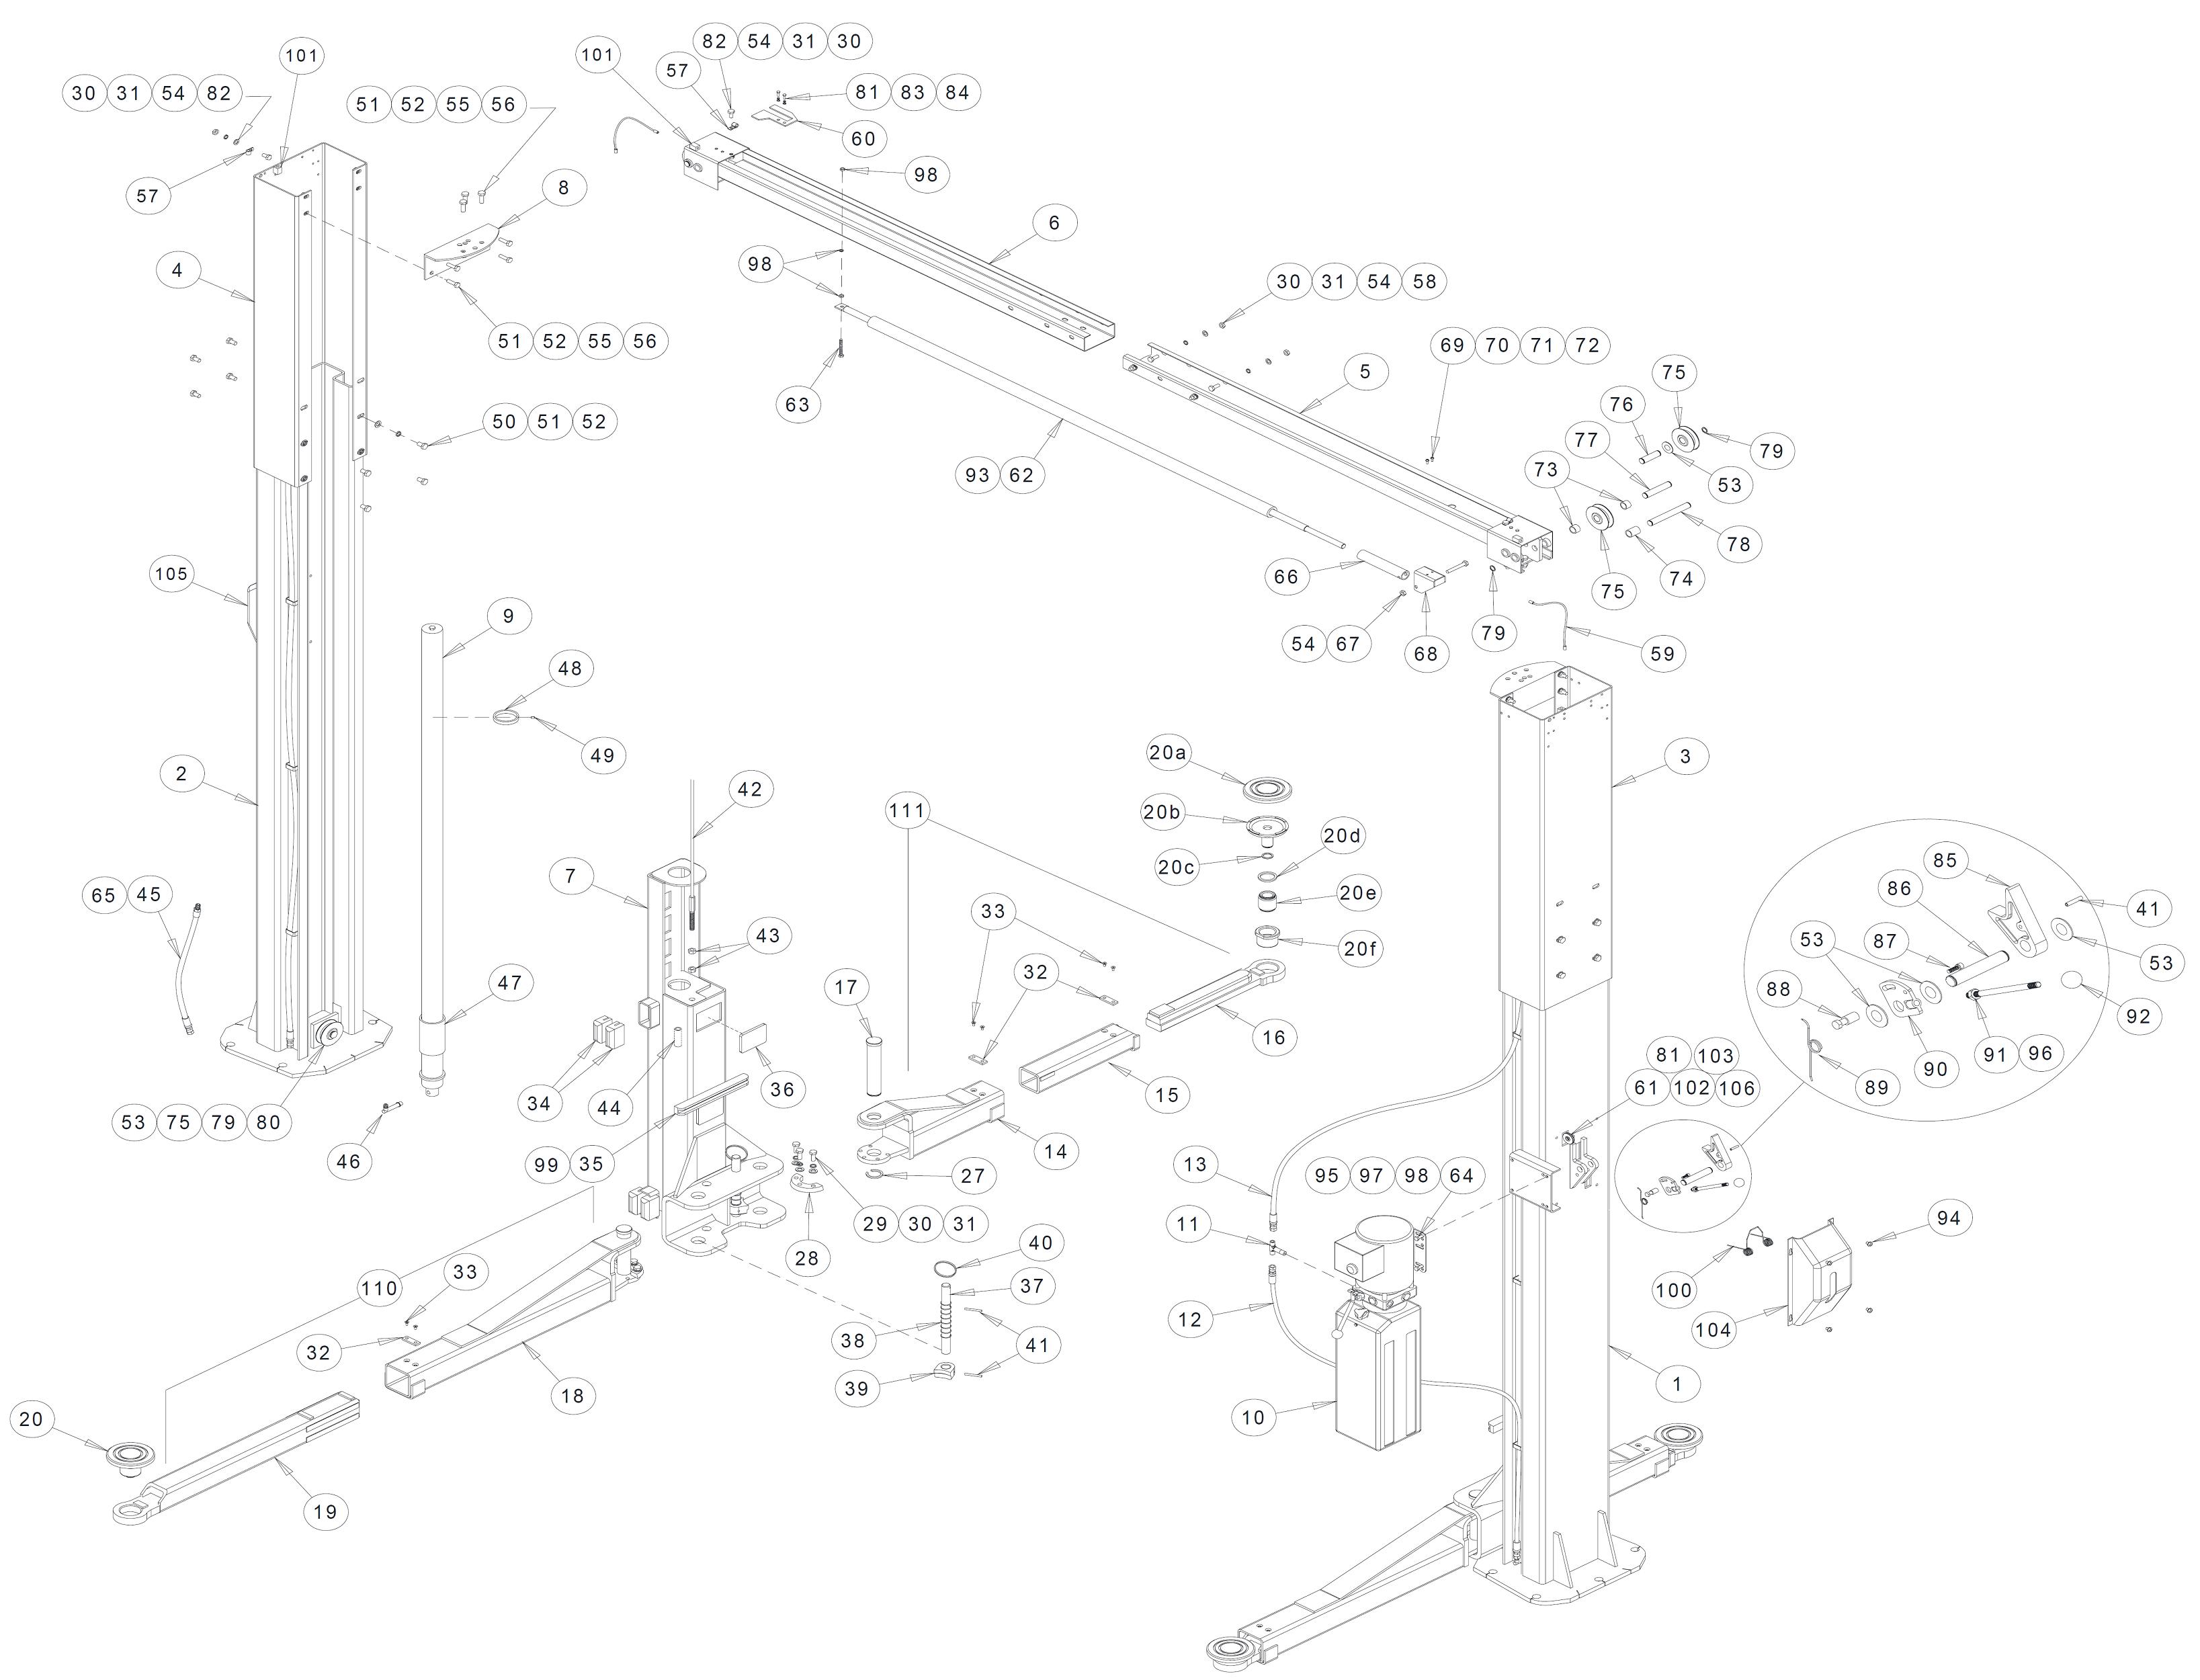 sa10-complete-diagram.png